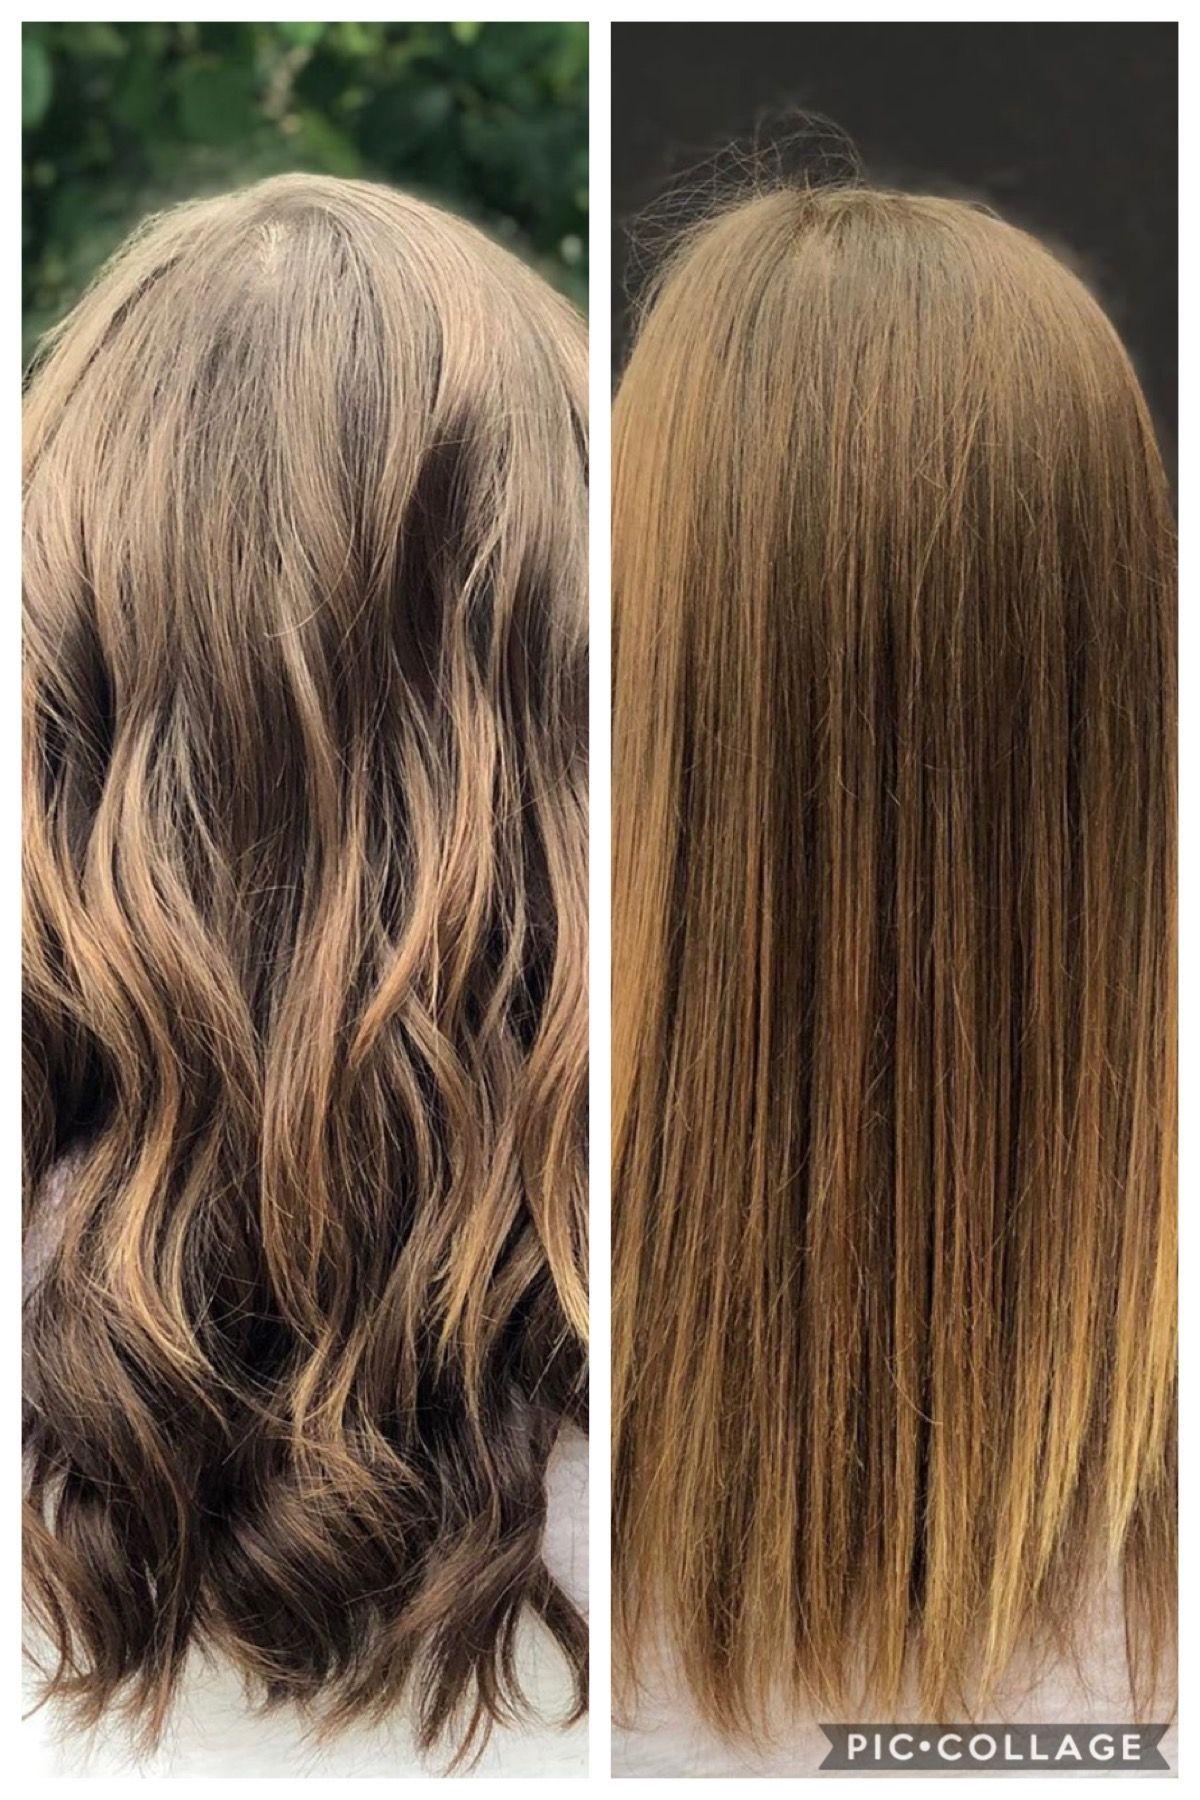 Hair Extensions Hair Extensions Curly Hair Salon Curly Hair Styles